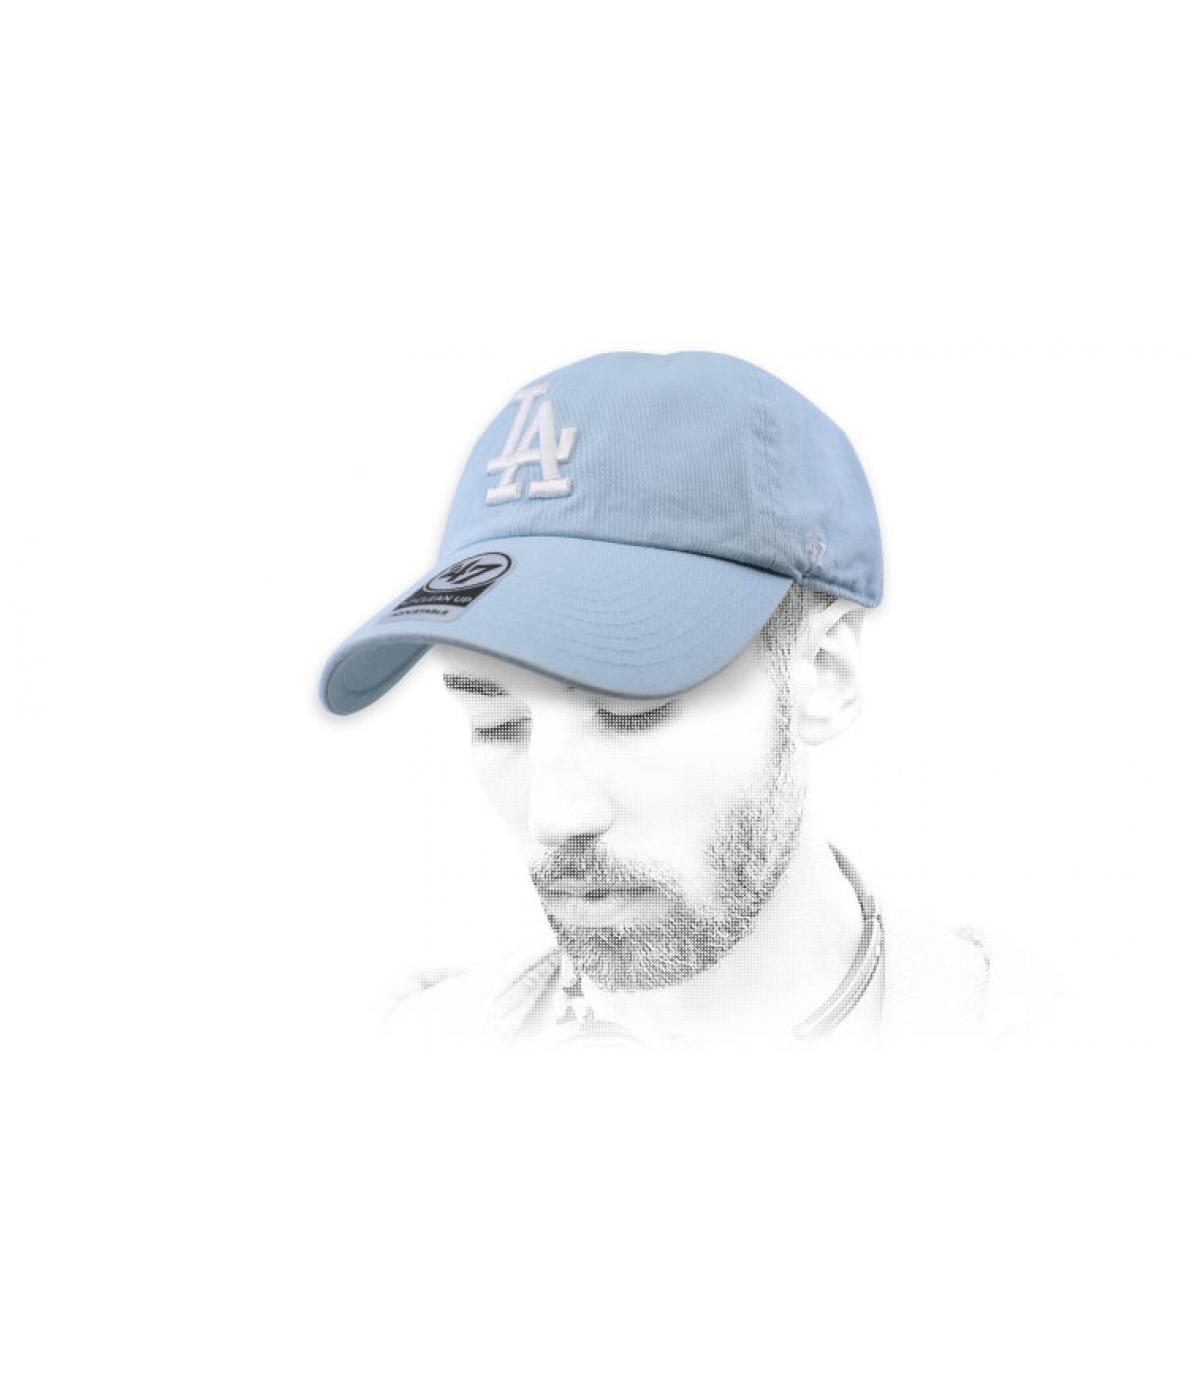 gorra LA azul claro